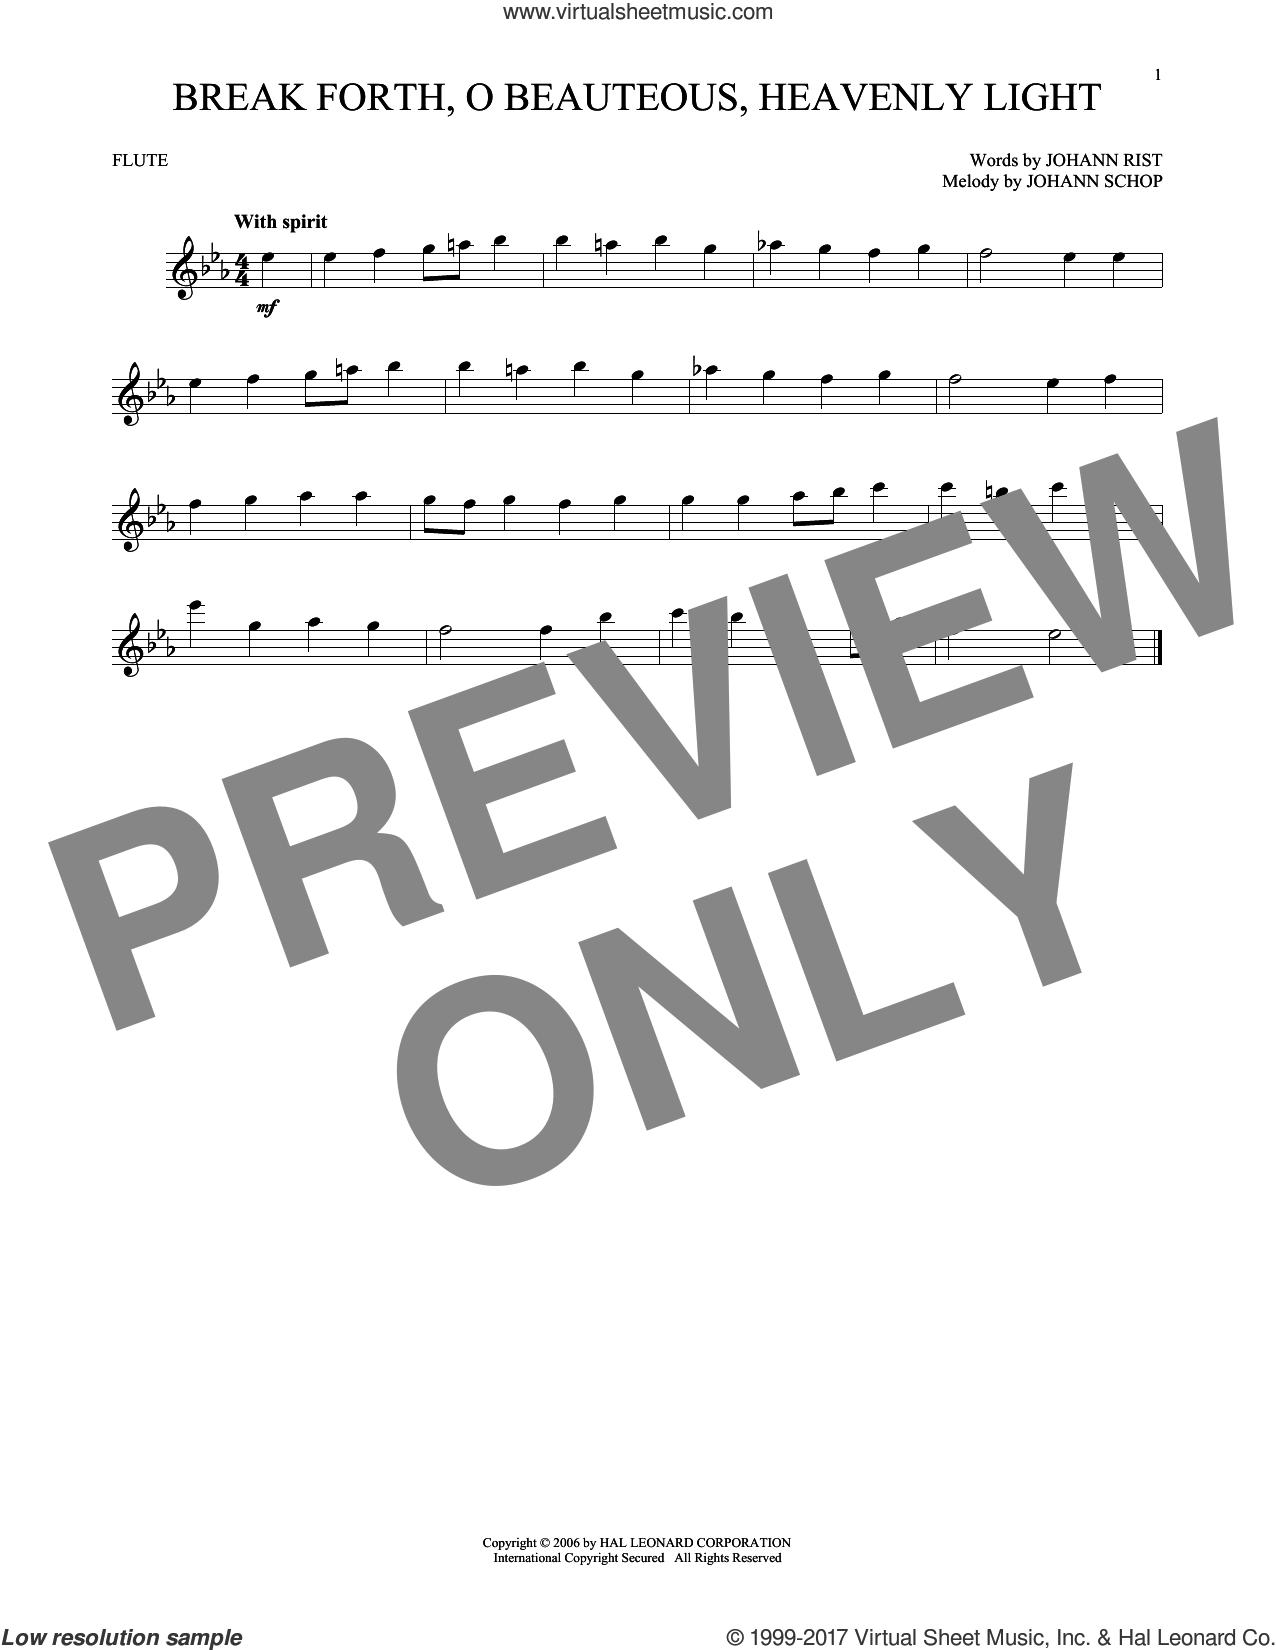 Break Forth, O Beauteous, Heavenly Light sheet music for flute solo by Johann Sebastian Bach, Johann Rist, Johann Schop and John Troutbeck (trans.), classical score, intermediate skill level